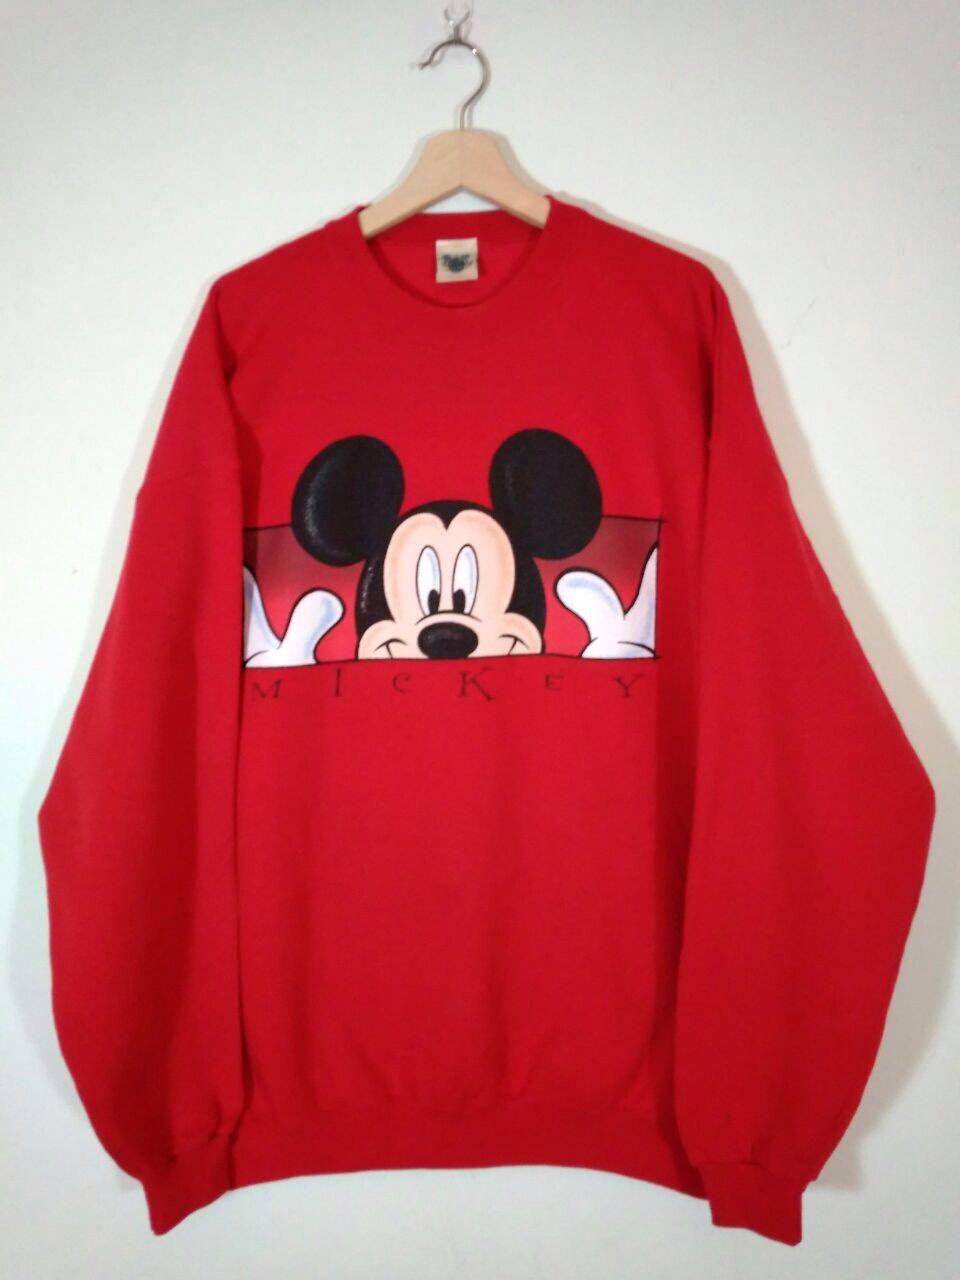 Rare Disney Mickey Mouse Red Crewneck Oversized Sweatshirt Sweater Jumper Size Xxl By Tweety3vintage On Etsy [ 1280 x 960 Pixel ]